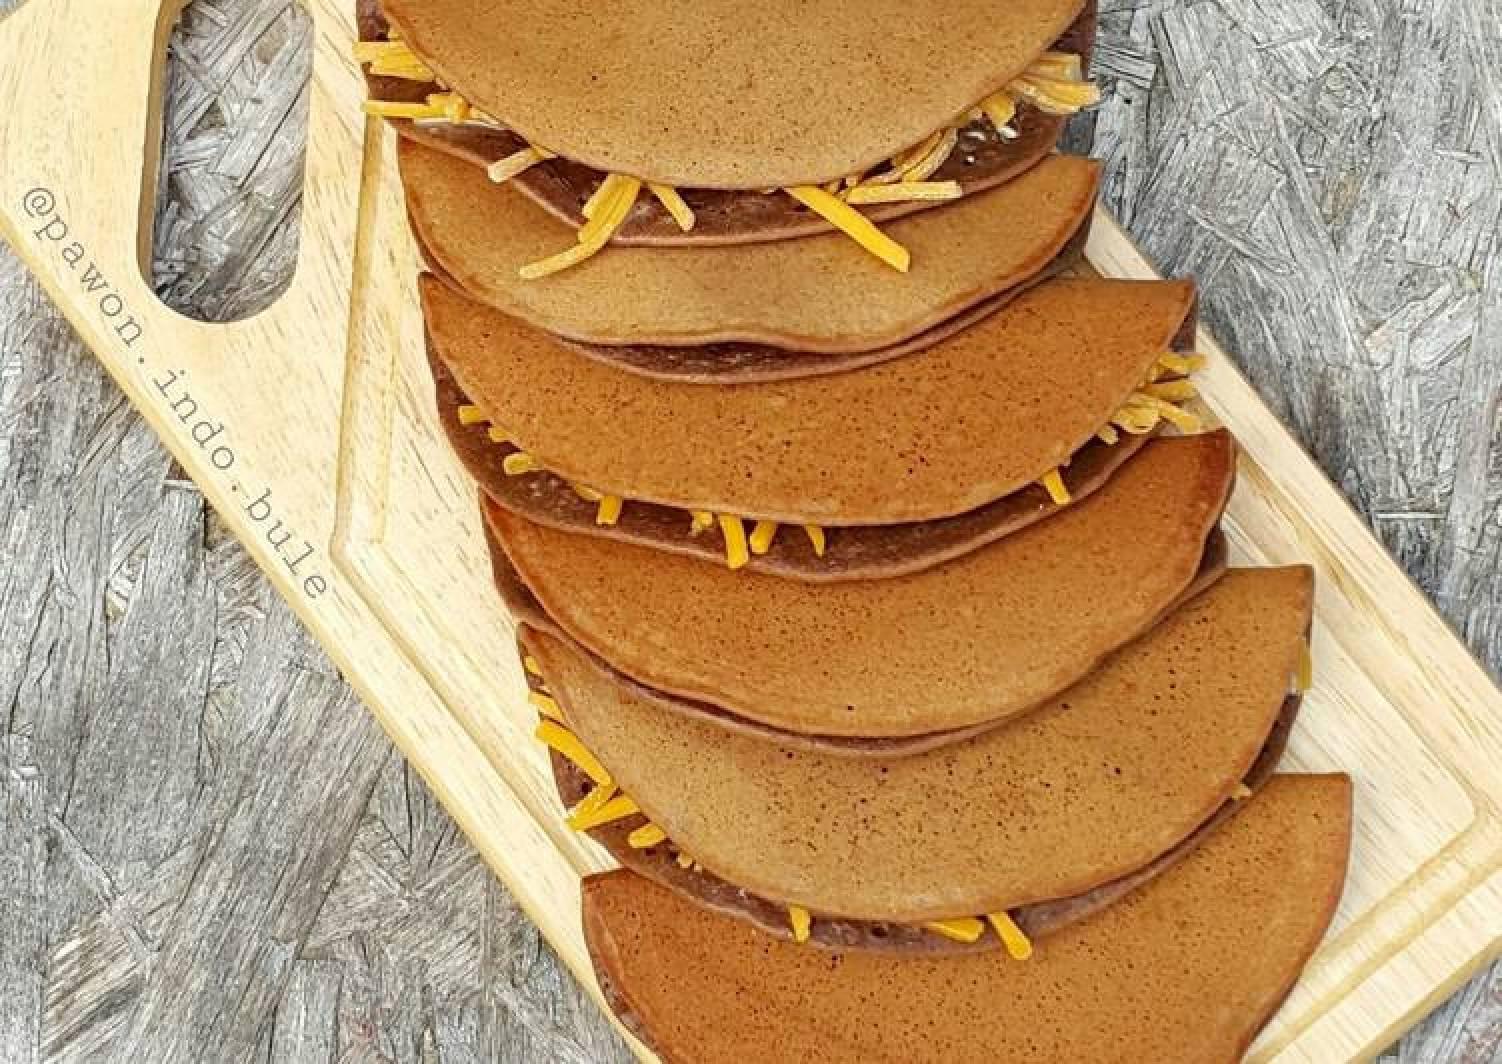 Indonesian Folded Chocolate Pancake (Martabak Manis Lipat)